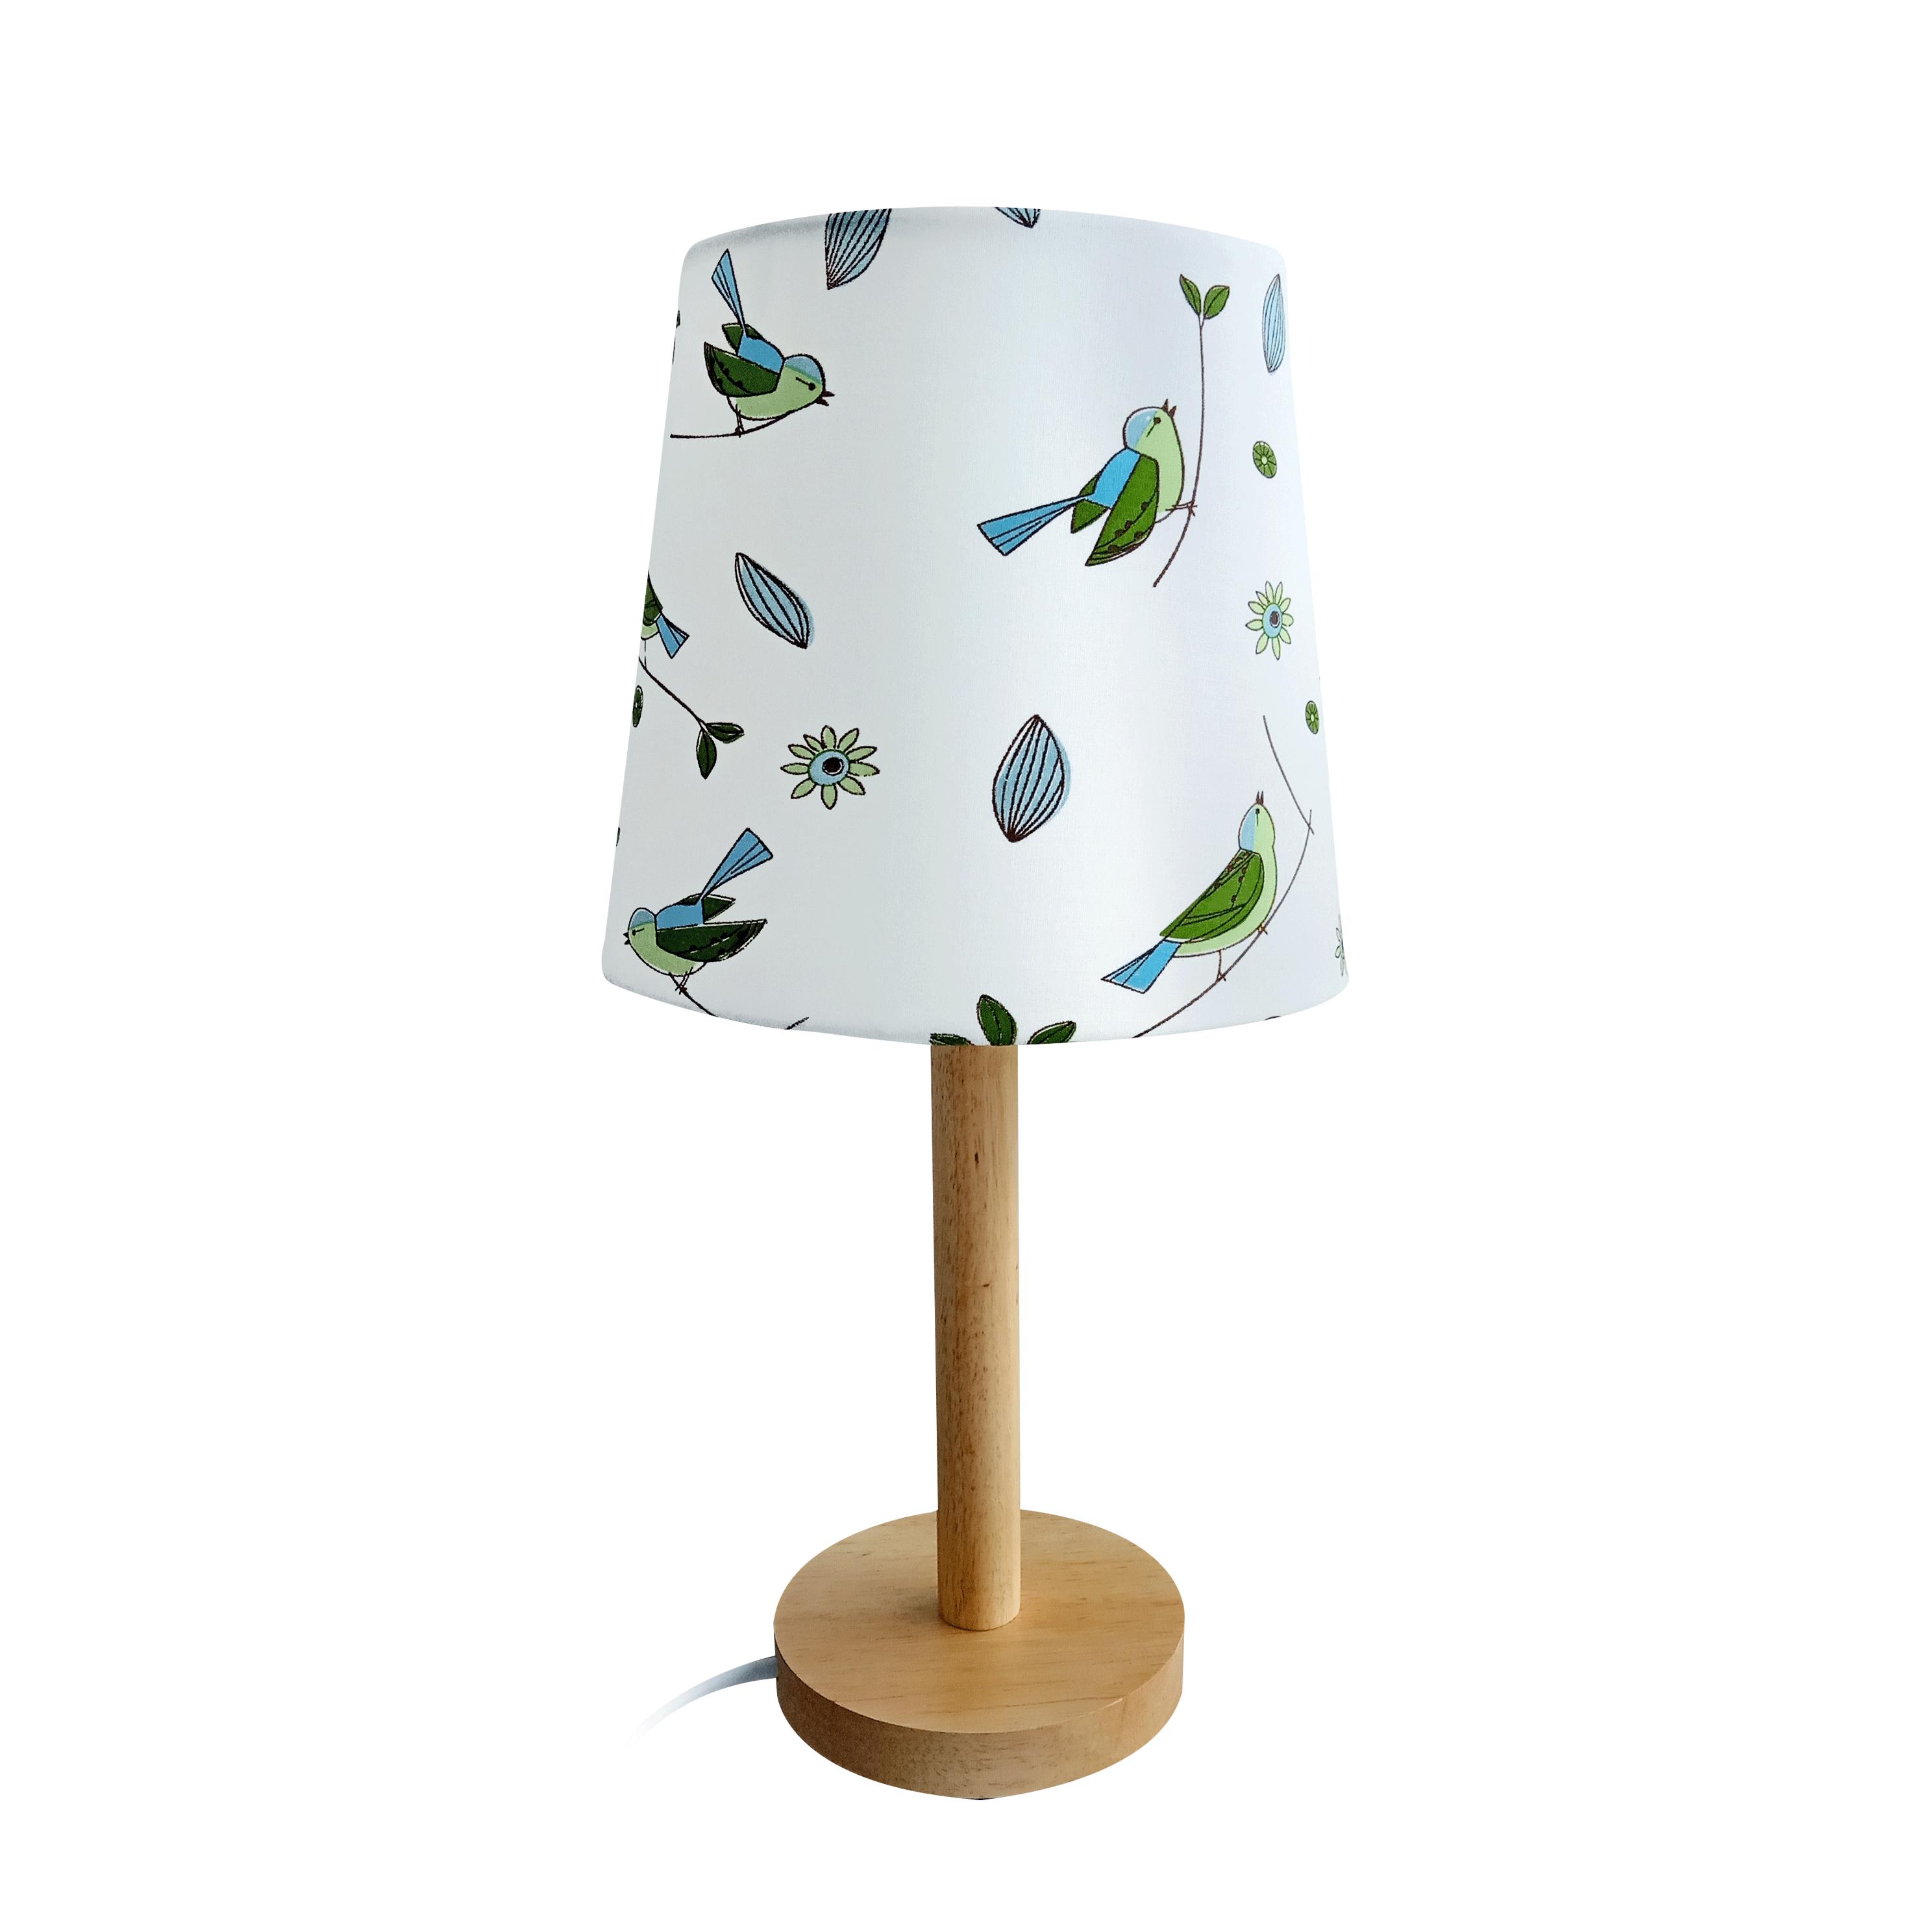 Lampă pe picior, lemn/material model pasăre, QENNY TYP 7 LT6026